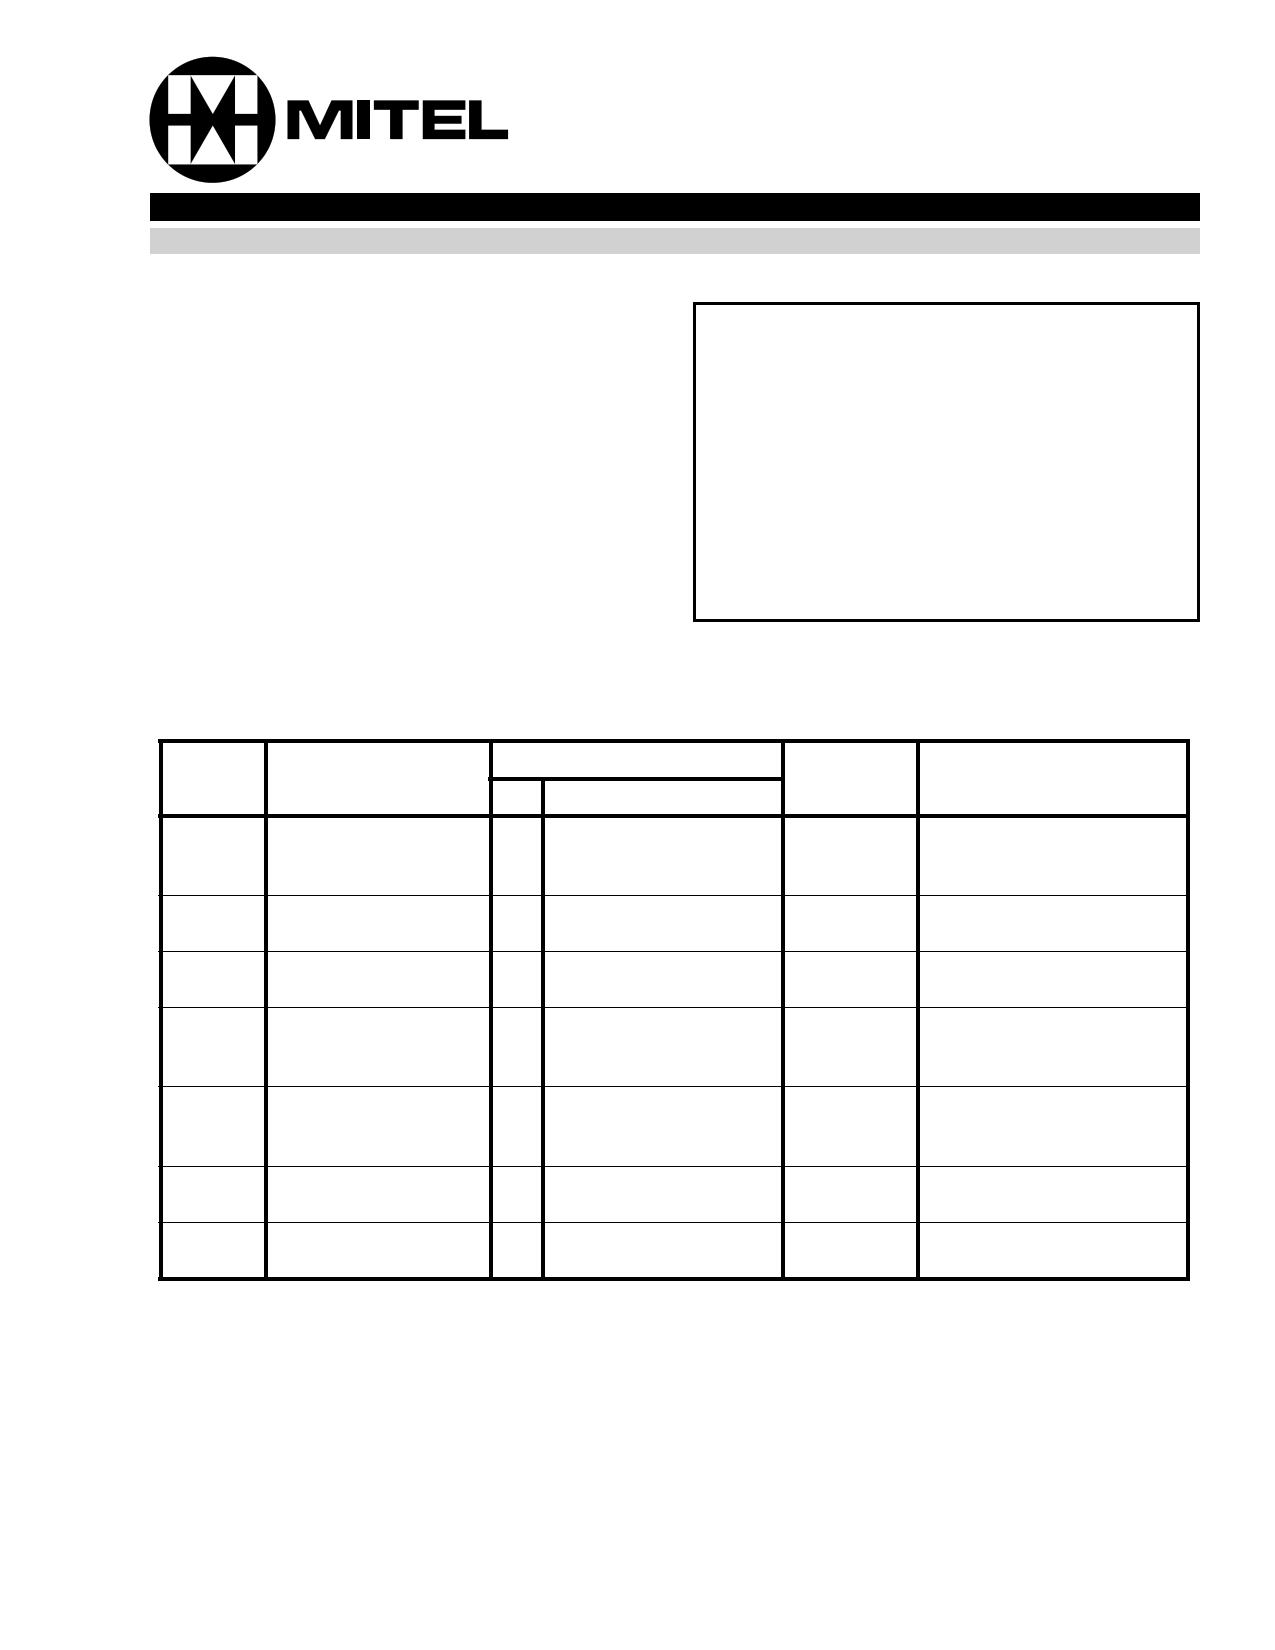 MB6010 데이터시트 및 MB6010 PDF